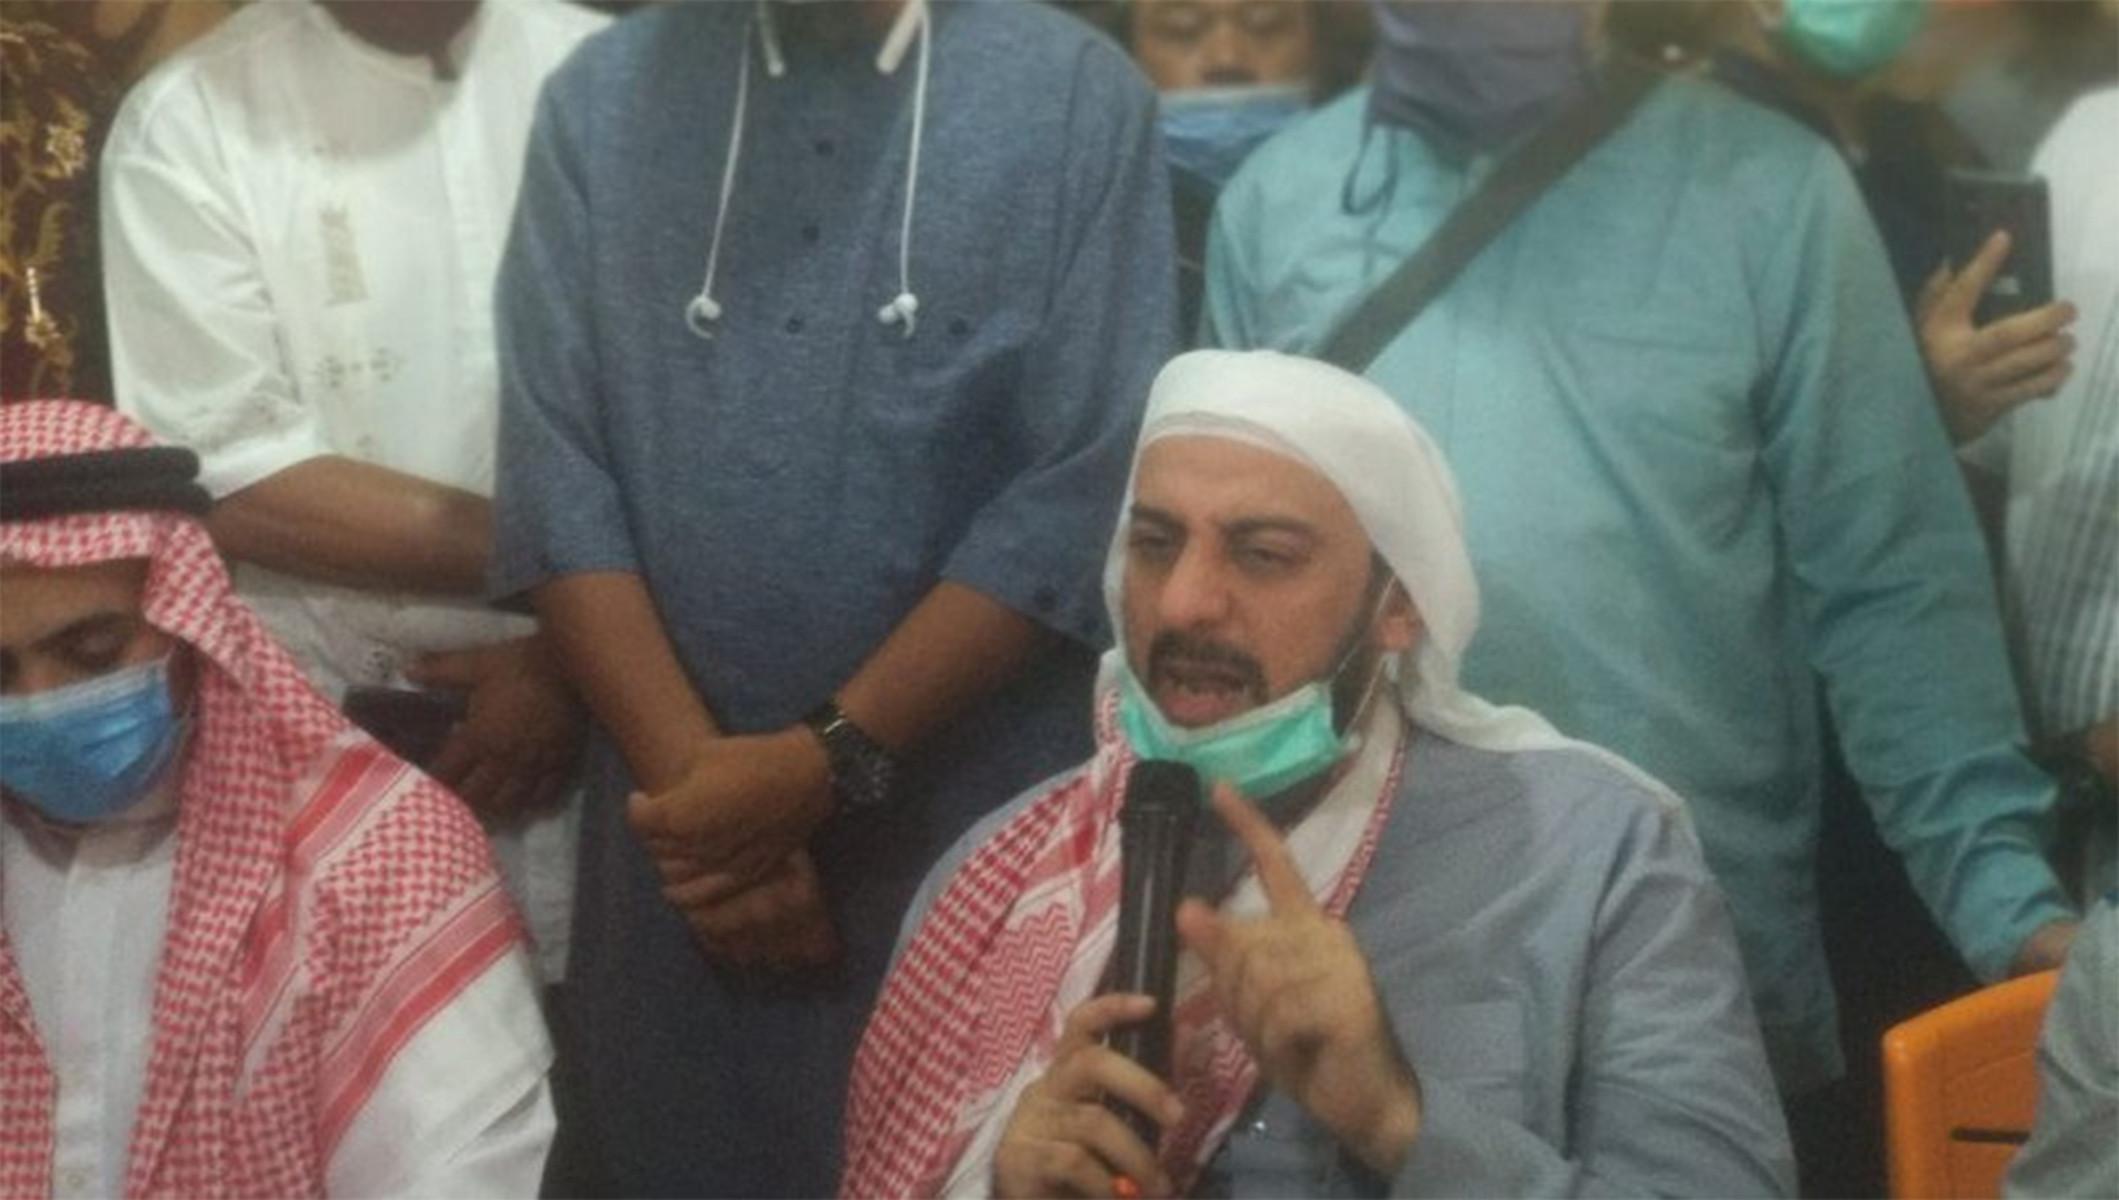 Syekh Ali Jaber Tidak Percaya Orang yang Menusuknya Gila - JPNN.com